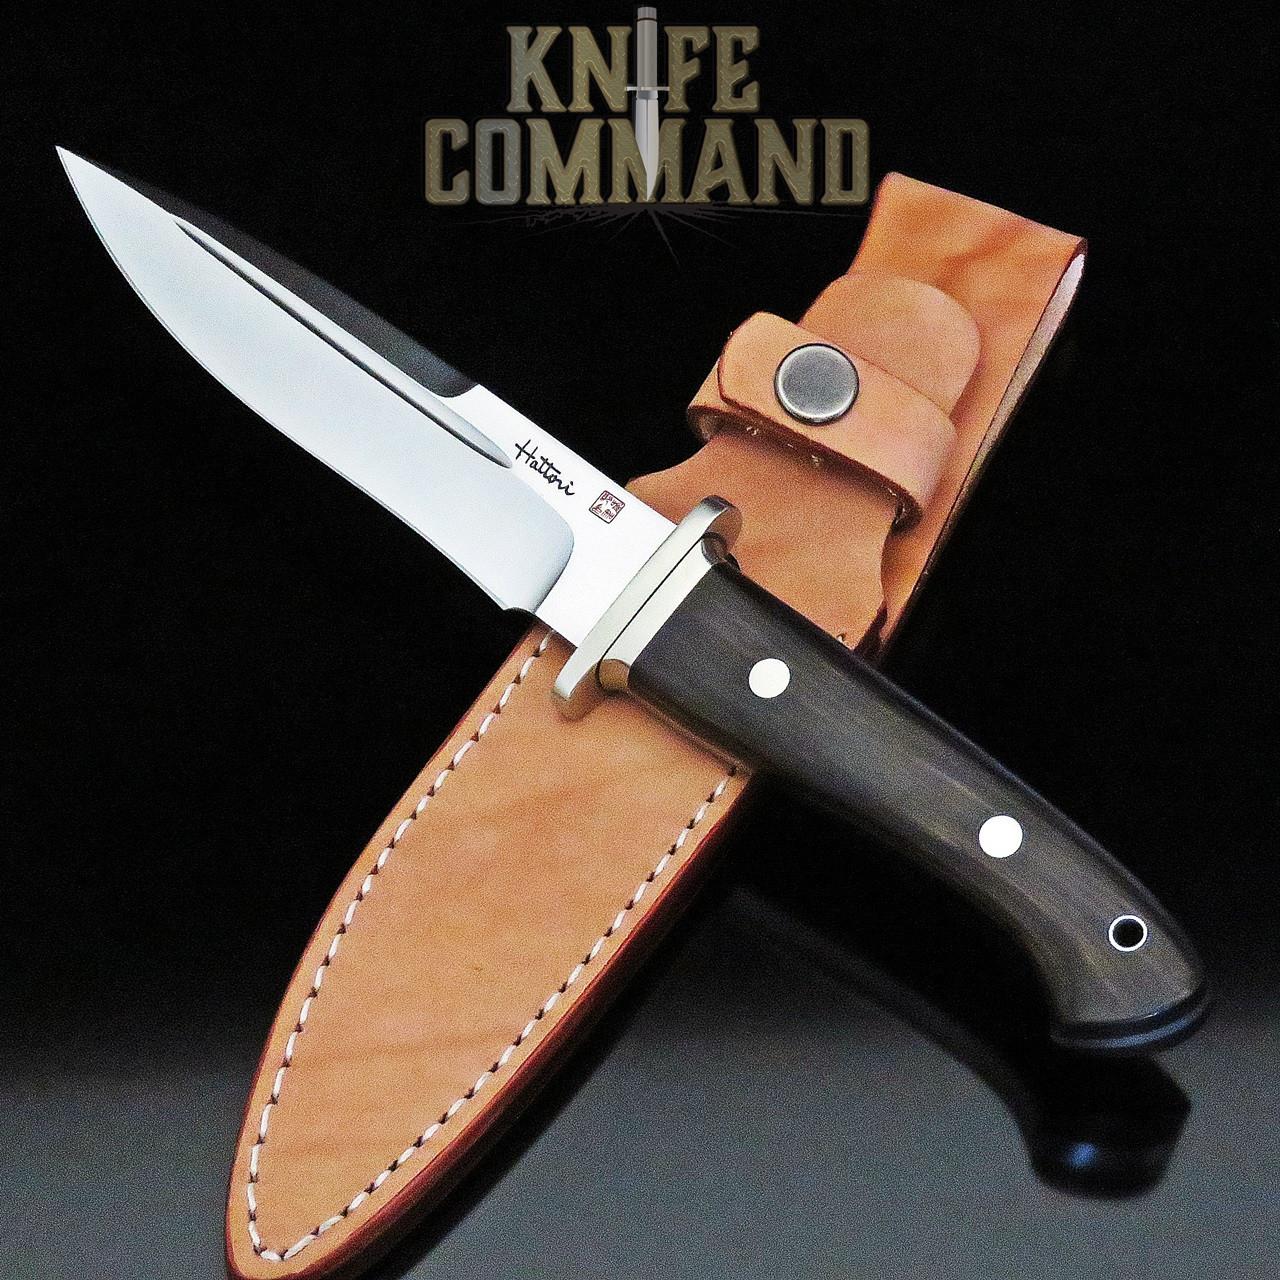 Hattori Knives FT-100E Fighter Knife Ebony Wood